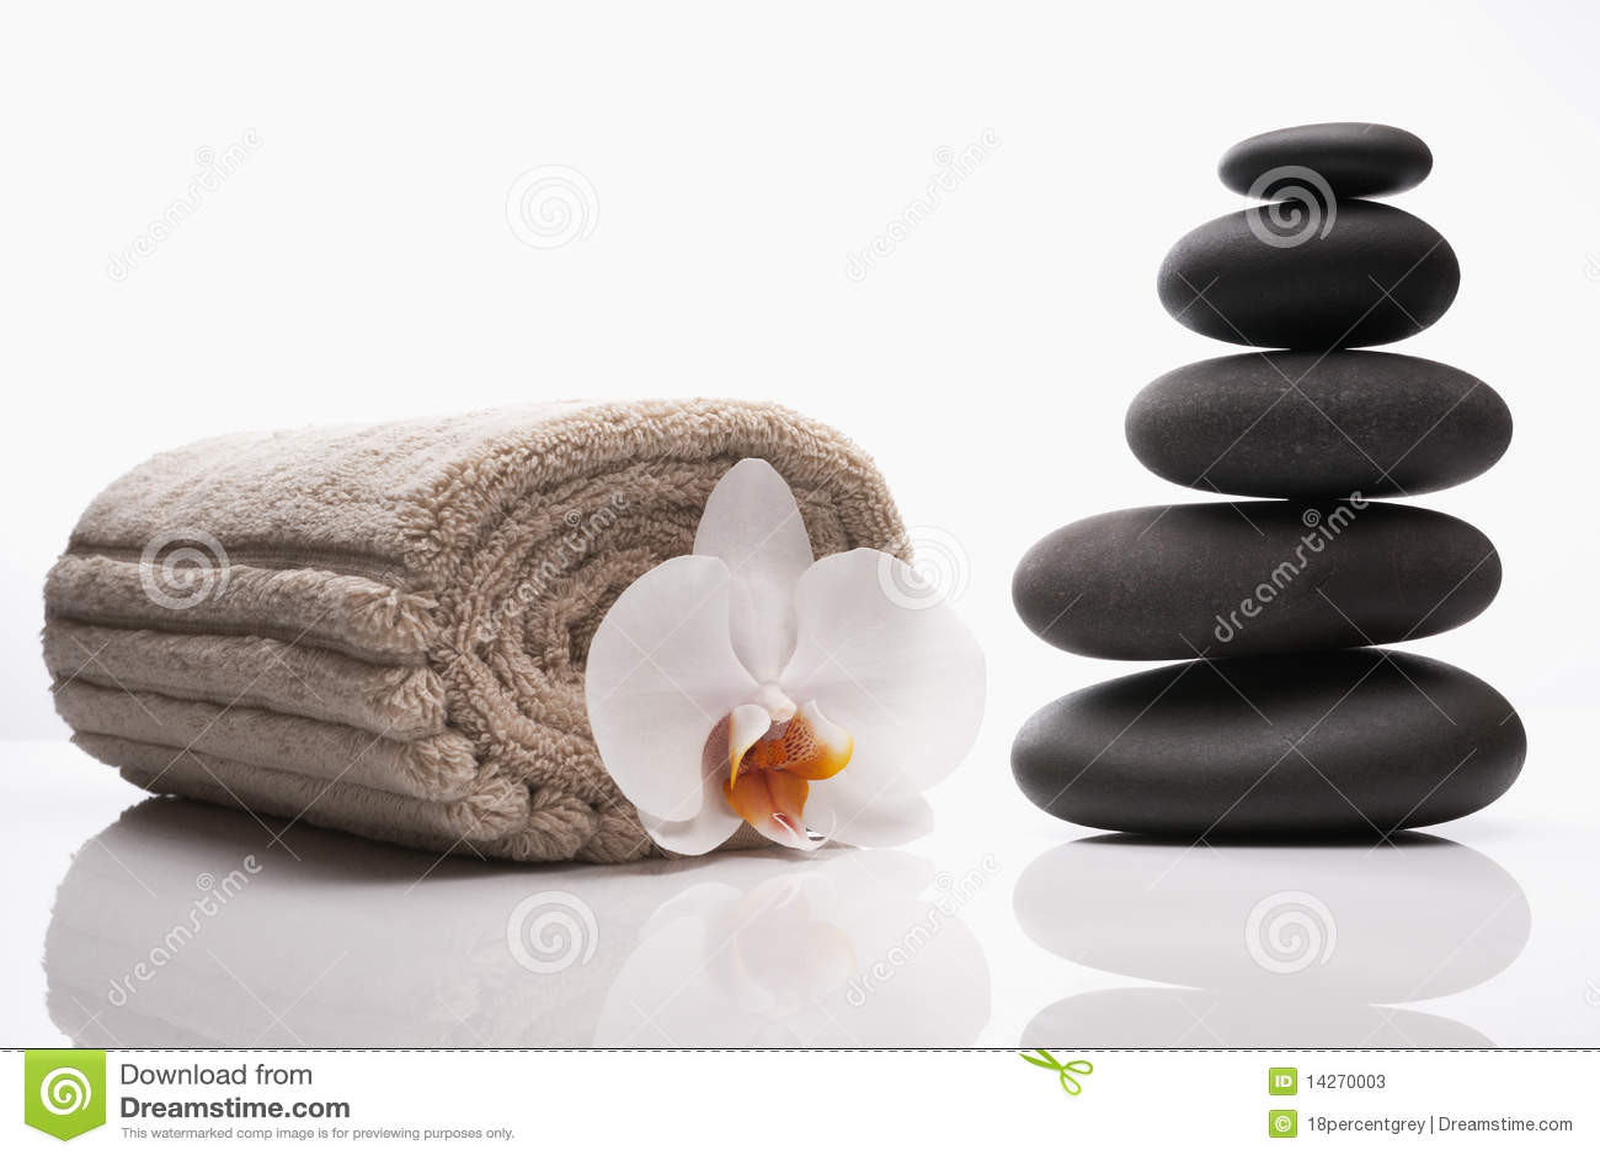 Luxury spa επεξεργασία